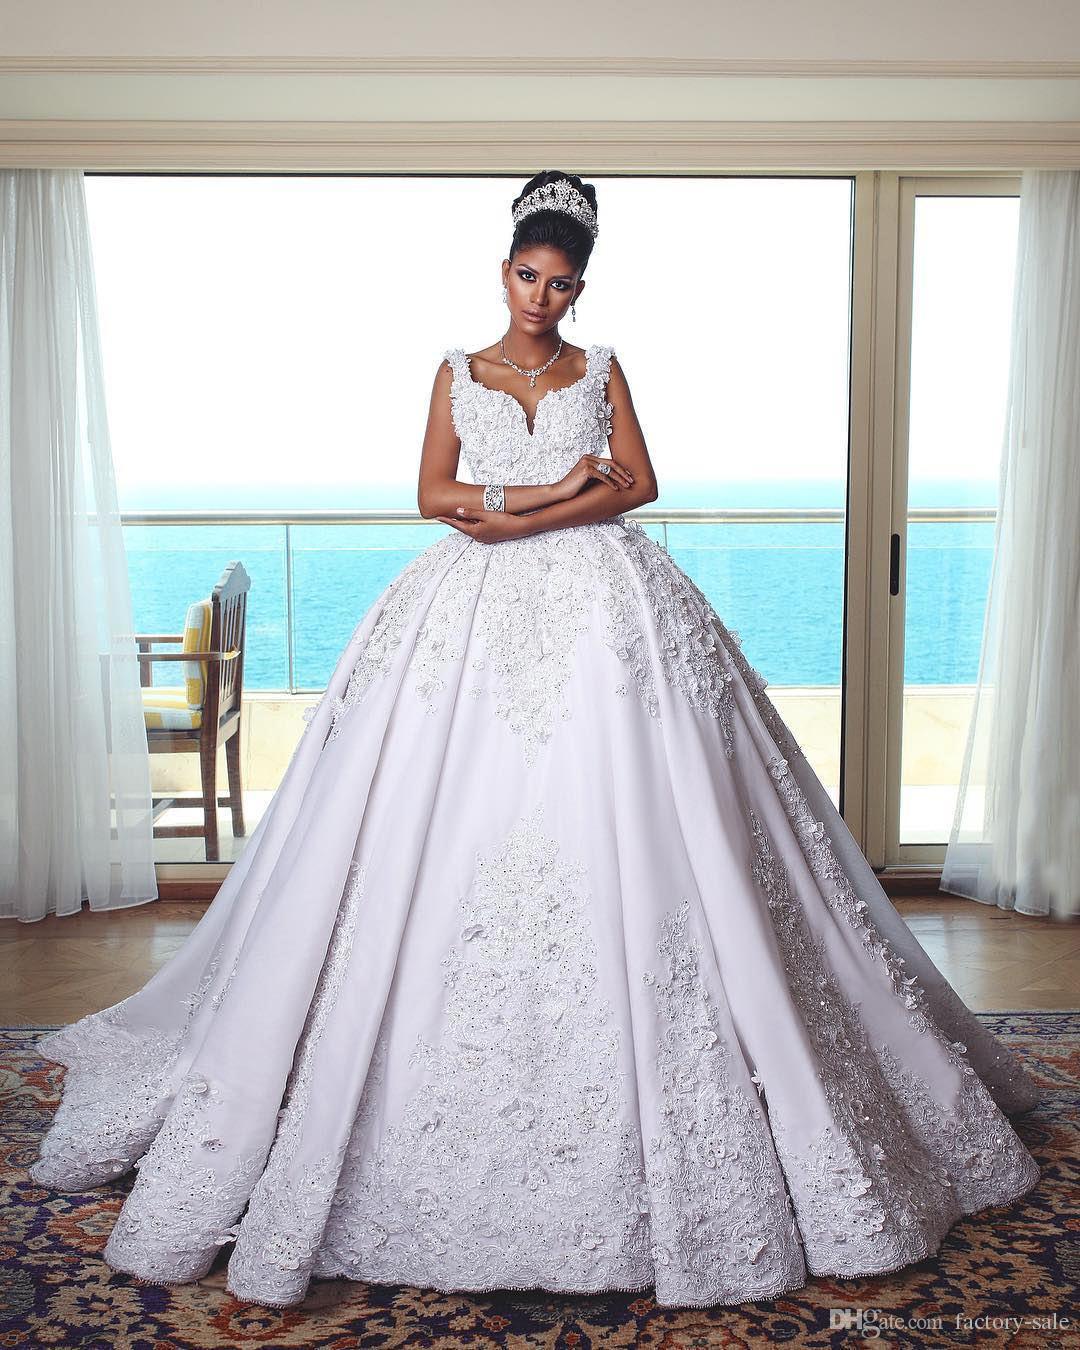 Luxe Princesse Nouvelle Arrivée Dentelle Robe De Bal Robe De Mariage Robes Profonde Cou V Train Applique Robe De Mariée Robes De Mariée Robe De Mariée